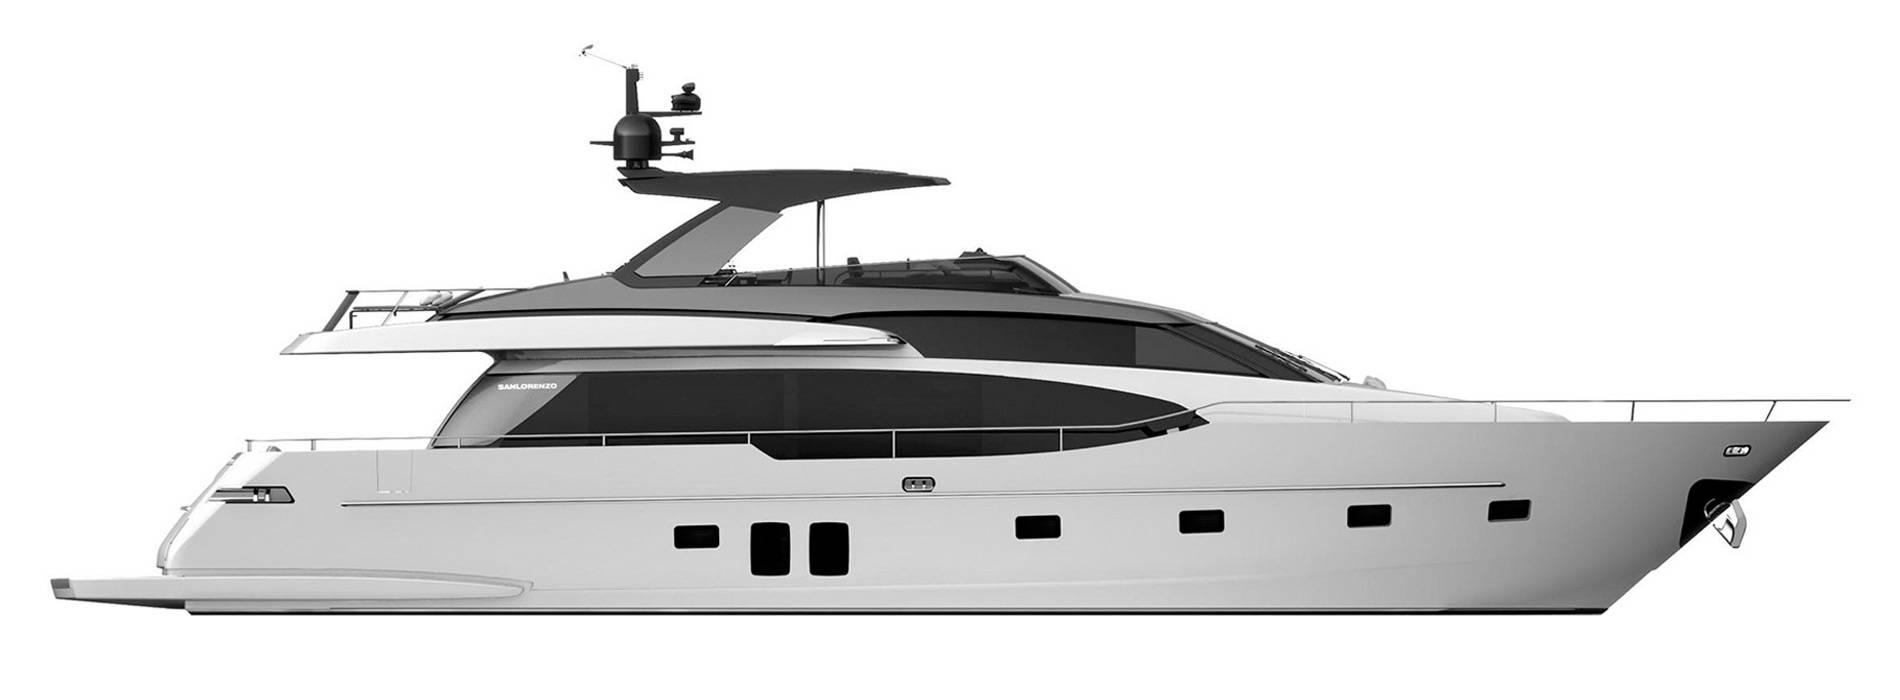 Sanlorenzo Yachts SL78 Профиль